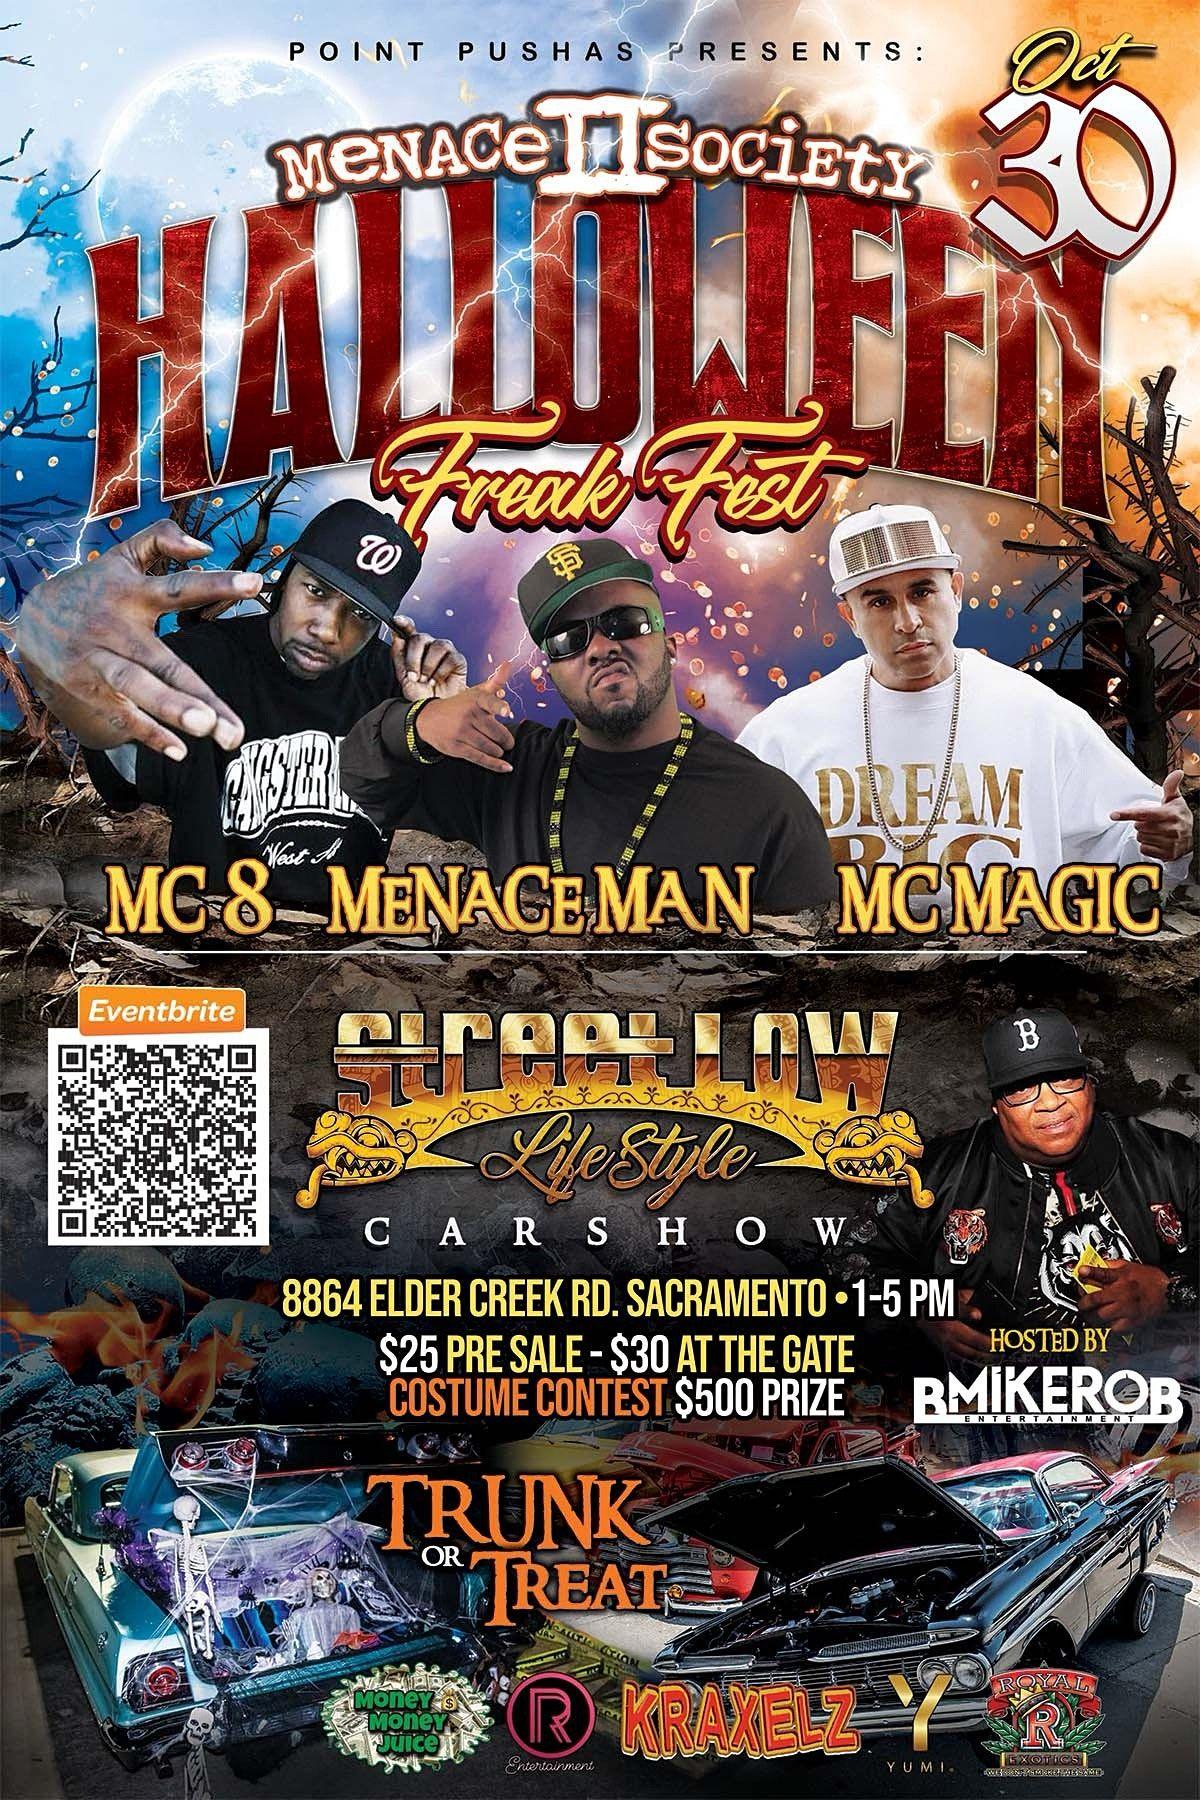 Menace II Society  Halloween Freak Fest, 30 October   Event in Sacramento   AllEvents.in